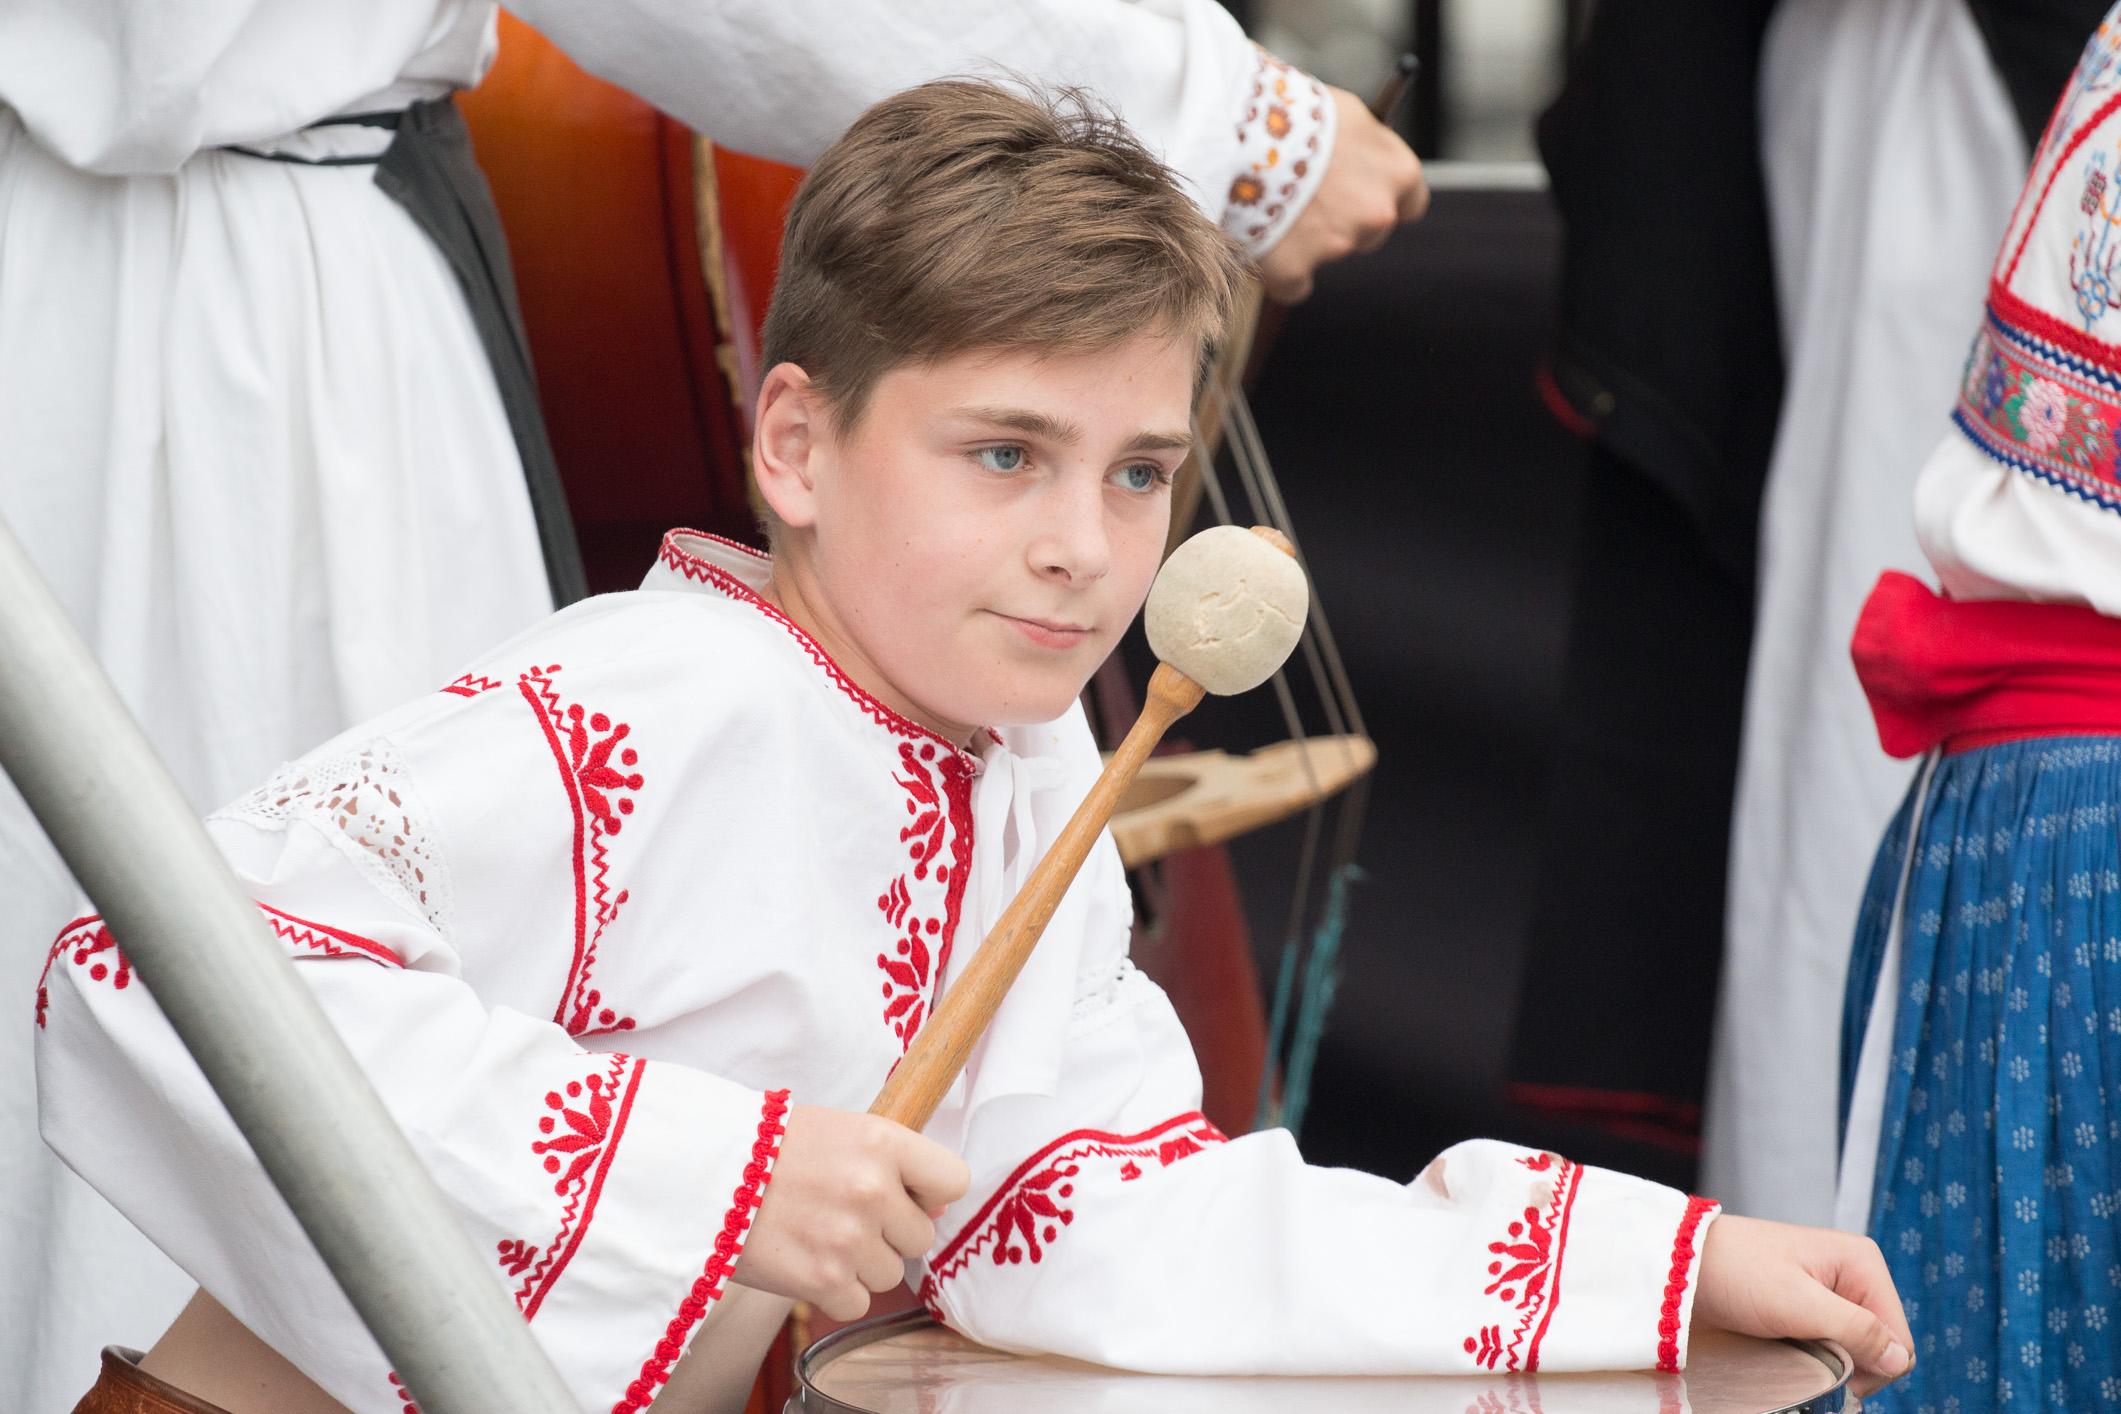 folklor-korzo-2016-zvolen-16